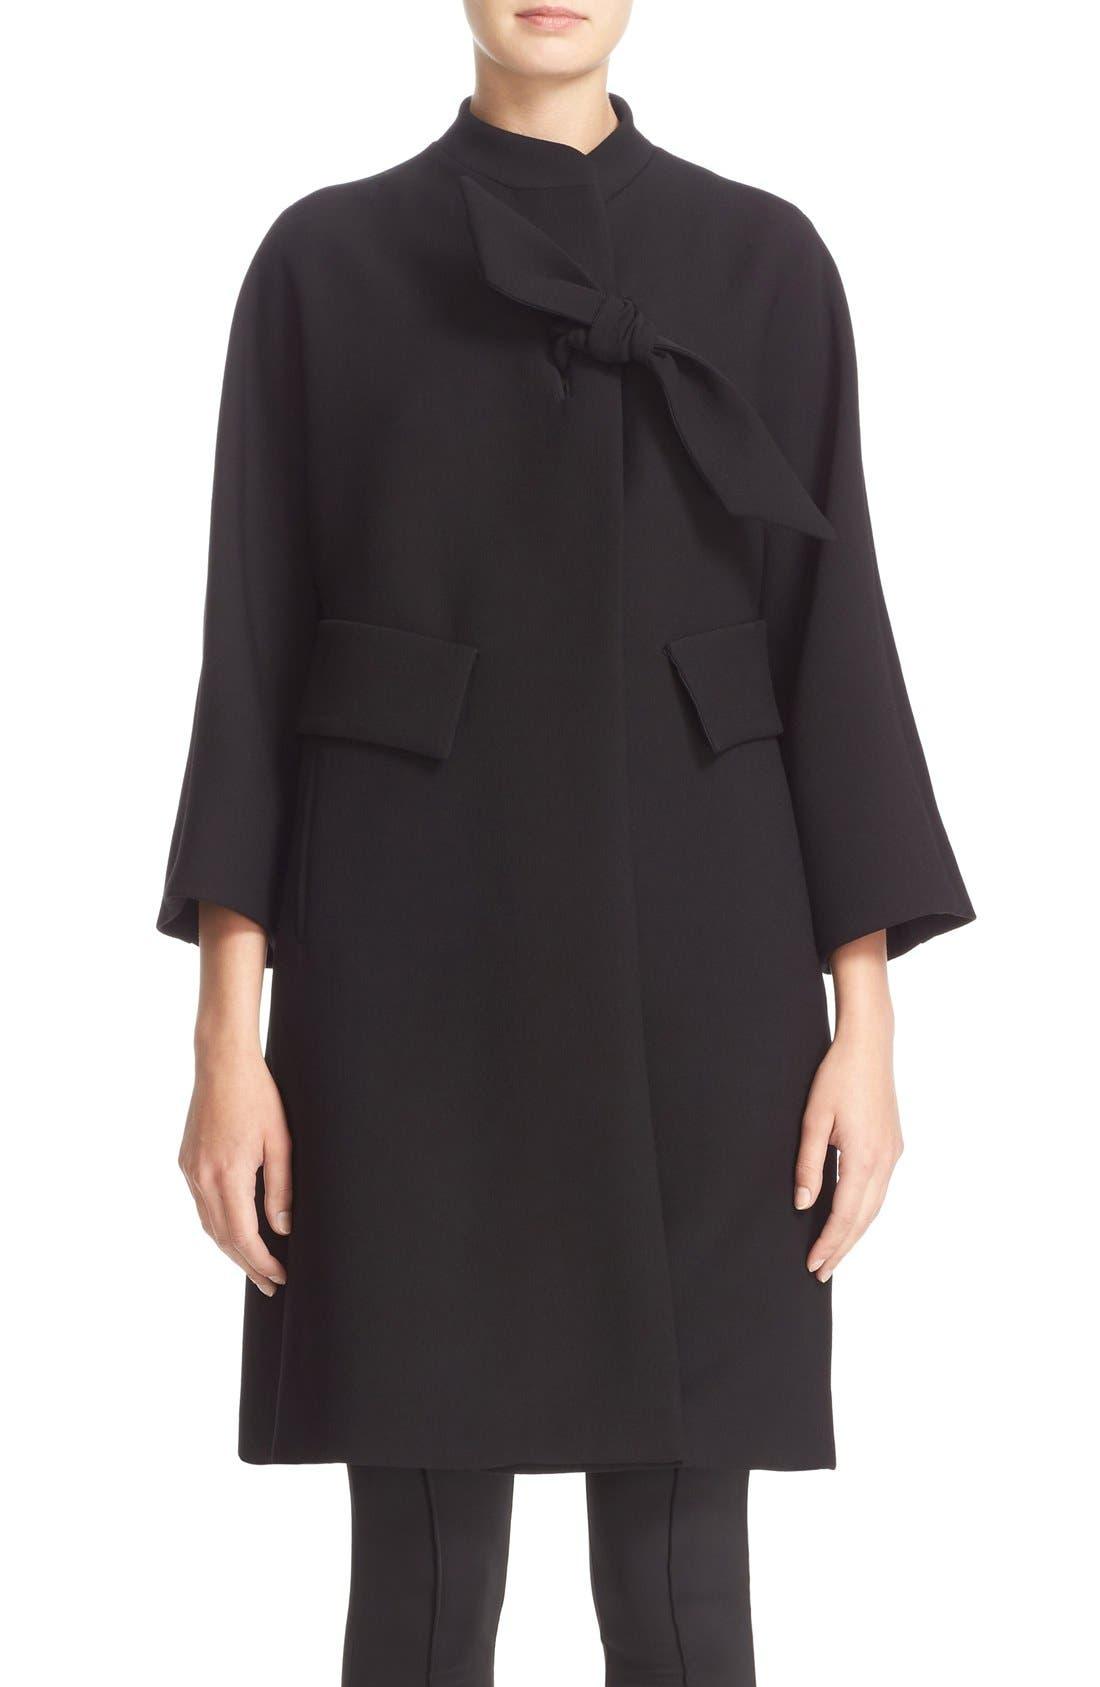 Alternate Image 1 Selected - Armani Collezioni Double Crepe Caban Jacket